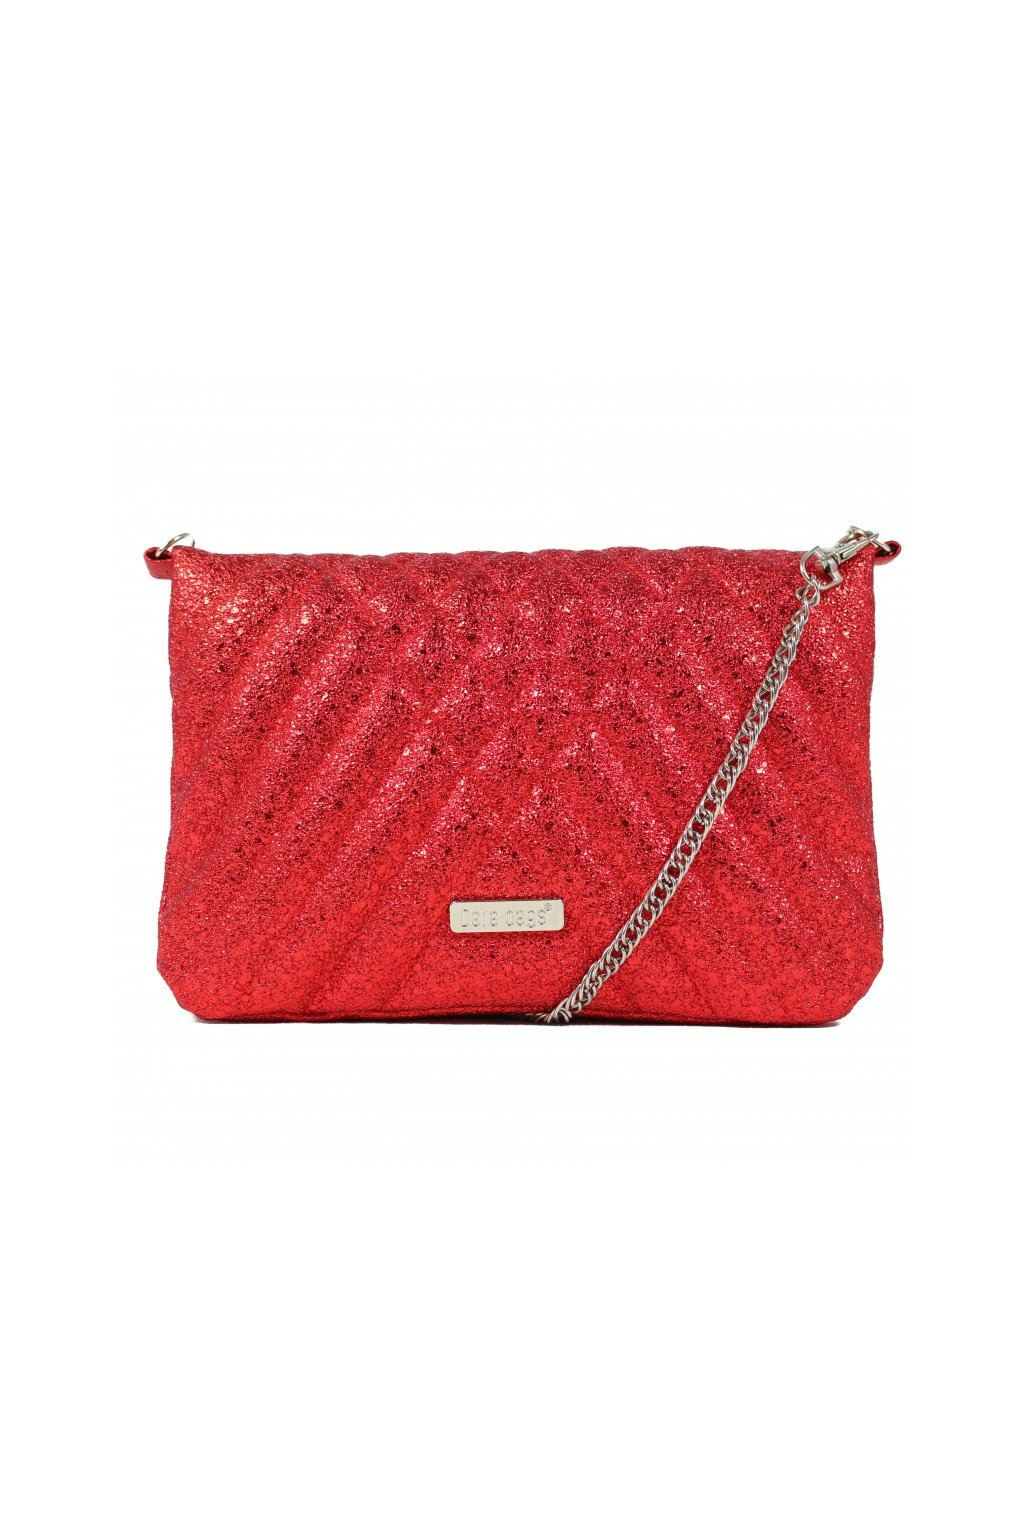 Třpytivá malá kabelka Cocktail Chick Dara bags červená 1